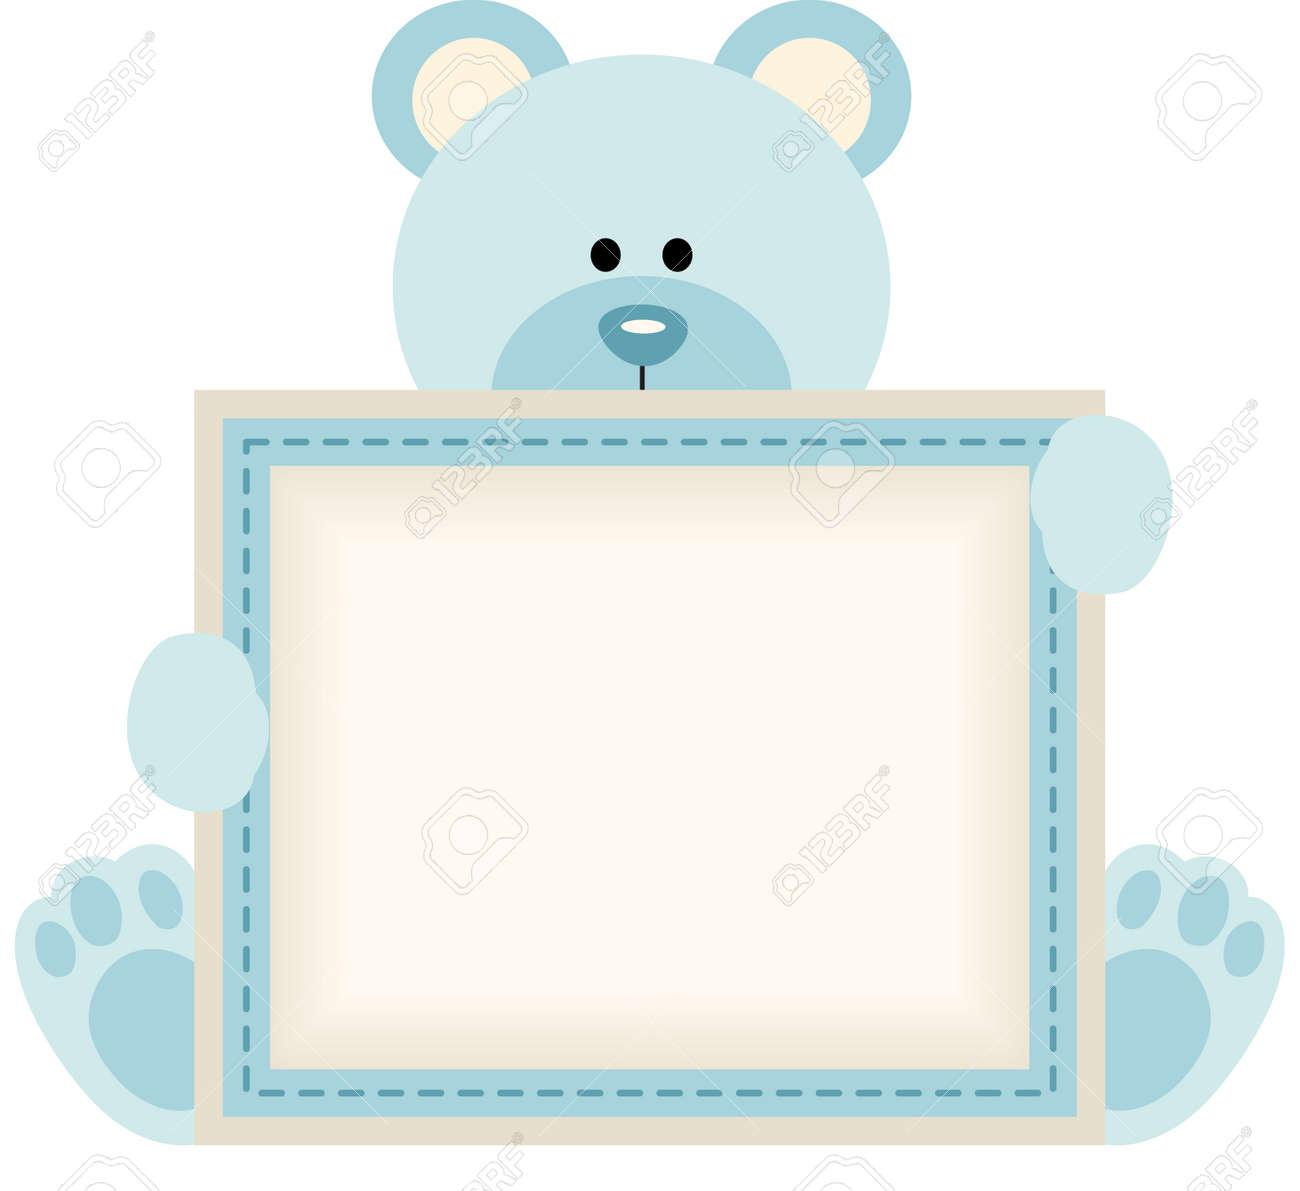 Cute teddy bear holding blank sign for baby boy announcement - 35688236